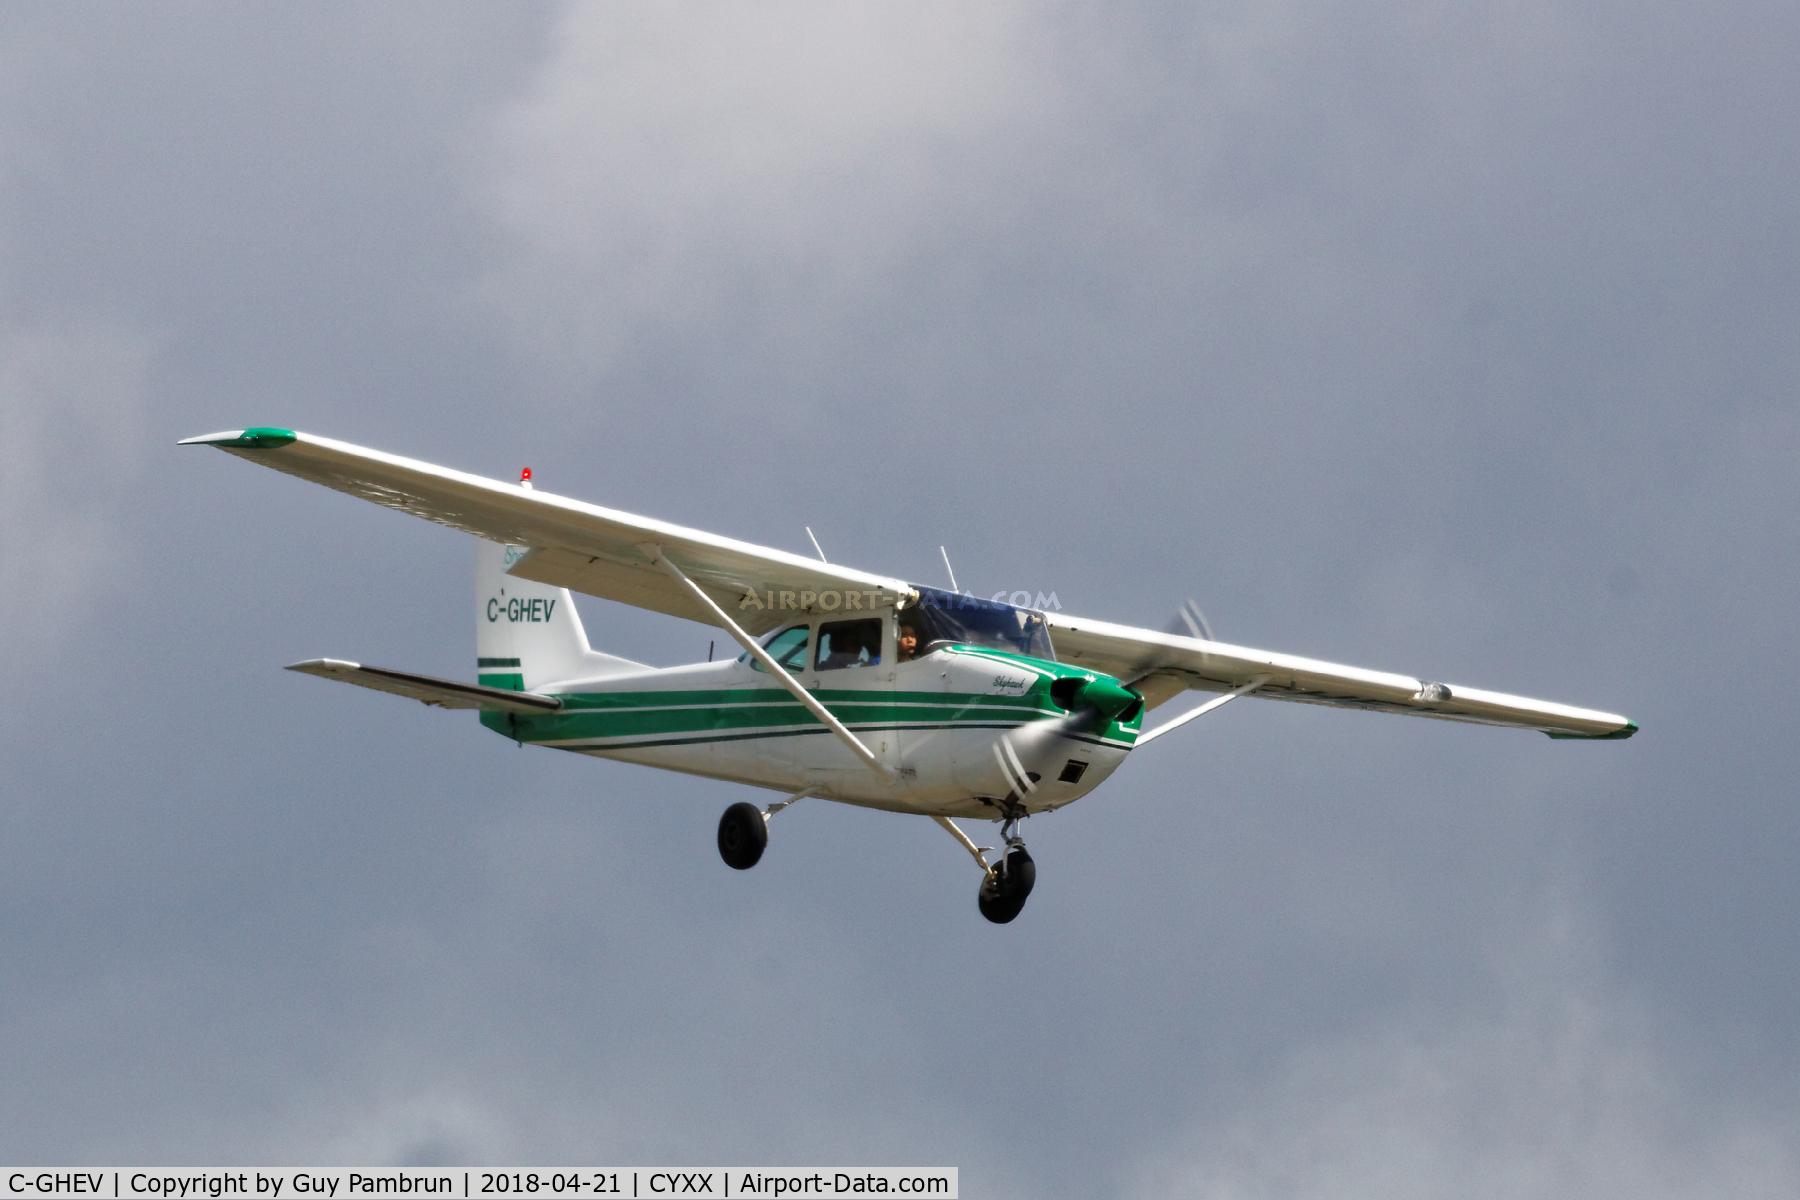 C-GHEV, 1968 Cessna 172I Skyhawk C/N 17256737, Landing